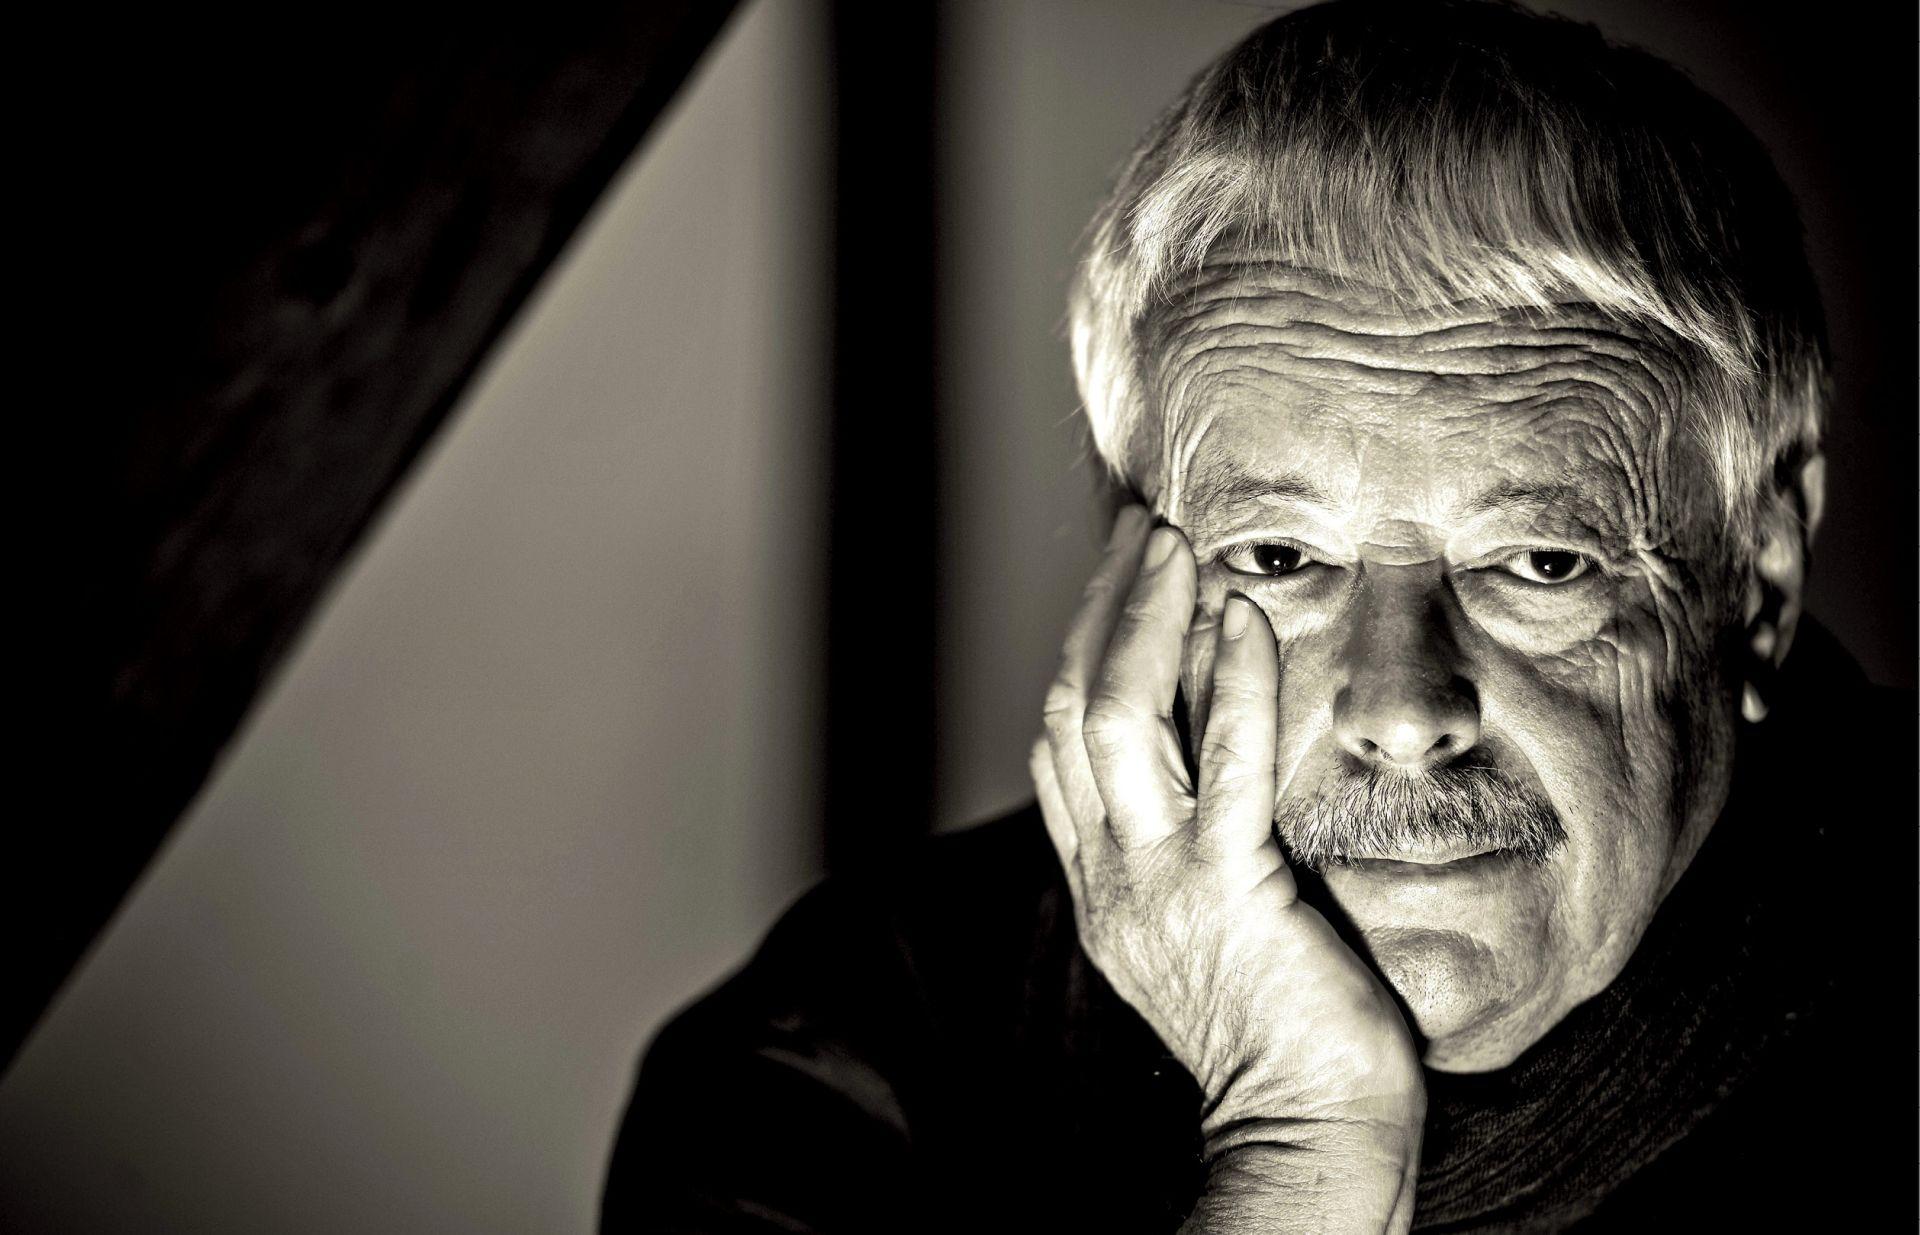 INTERVIEW: SLOBODAN ŠNAJDER 'Zagreb se treba osloboditi primitivne Bandićeve diktature'